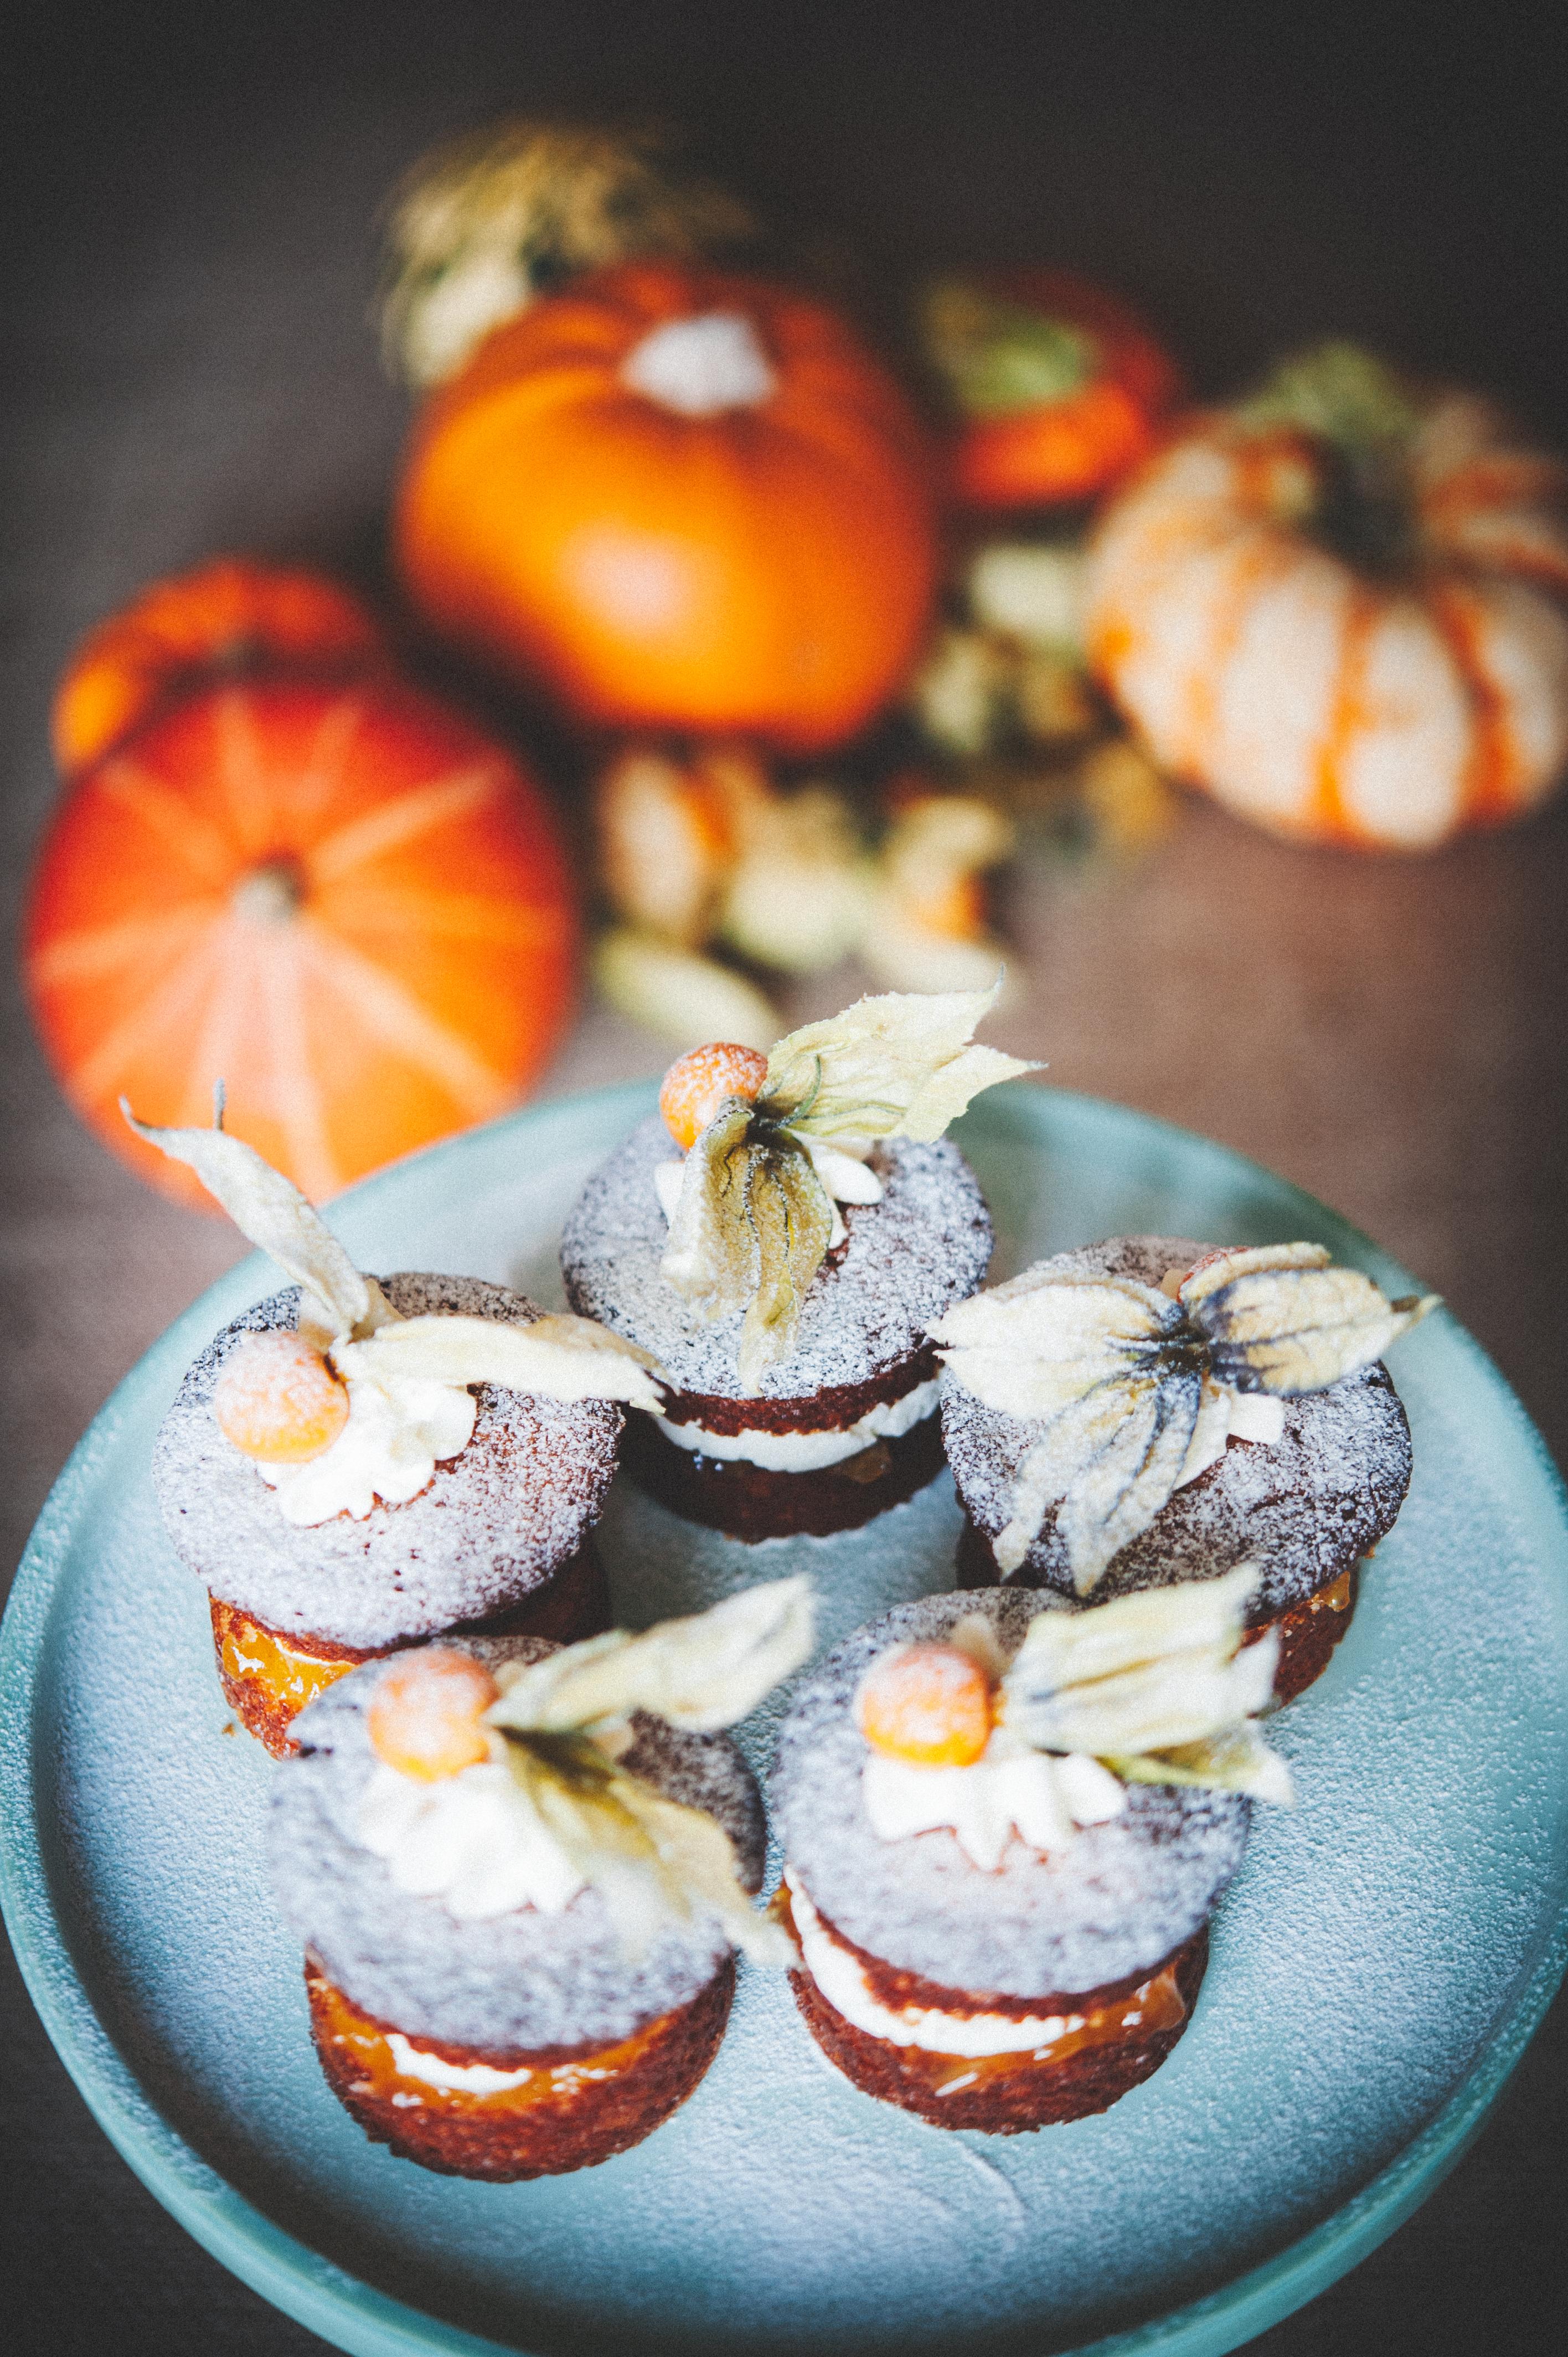 Pineapple & Physalis Mini Cakes